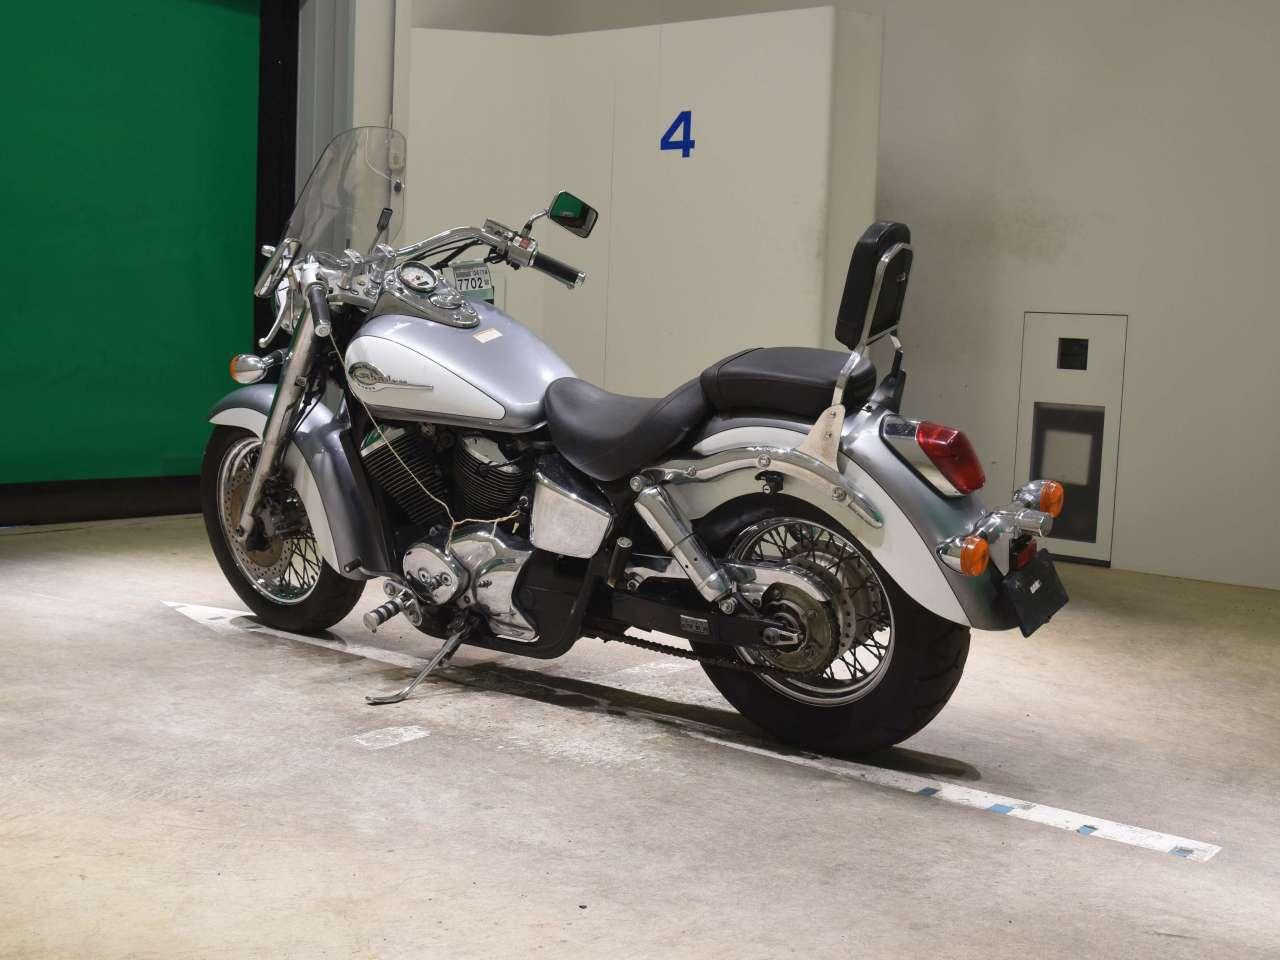 МОТОЦИКЛ HONDA SHADOW 400 2001  Артмото - купить квадроцикл в украине и харькове, мотоцикл, снегоход, скутер, мопед, электромобиль